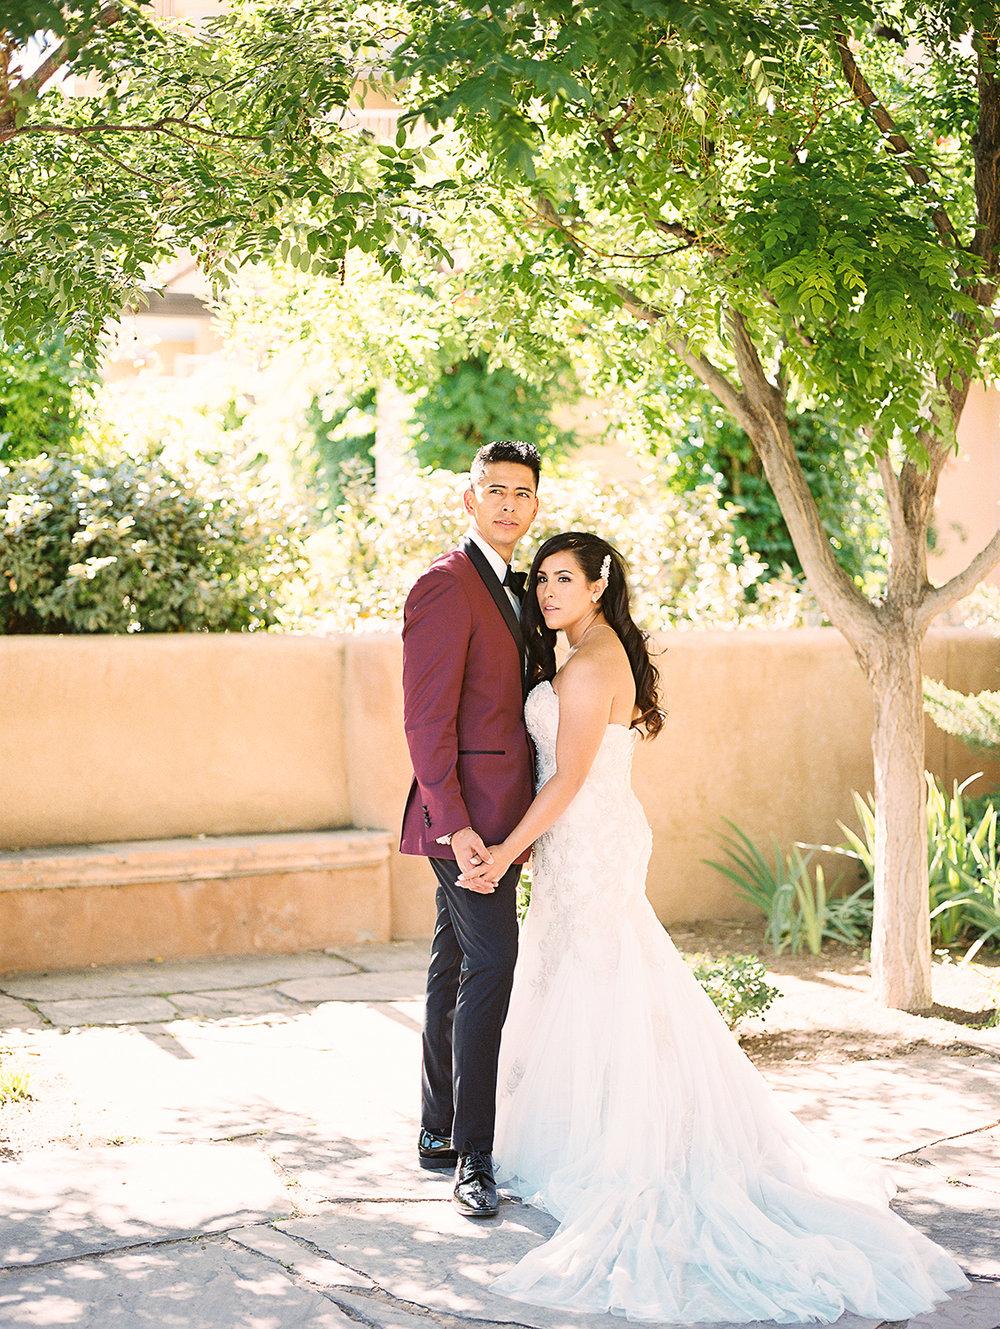 albuquerque-new-mexico-wedding-photographer-skylar-rain-photography-a-g-7.jpg